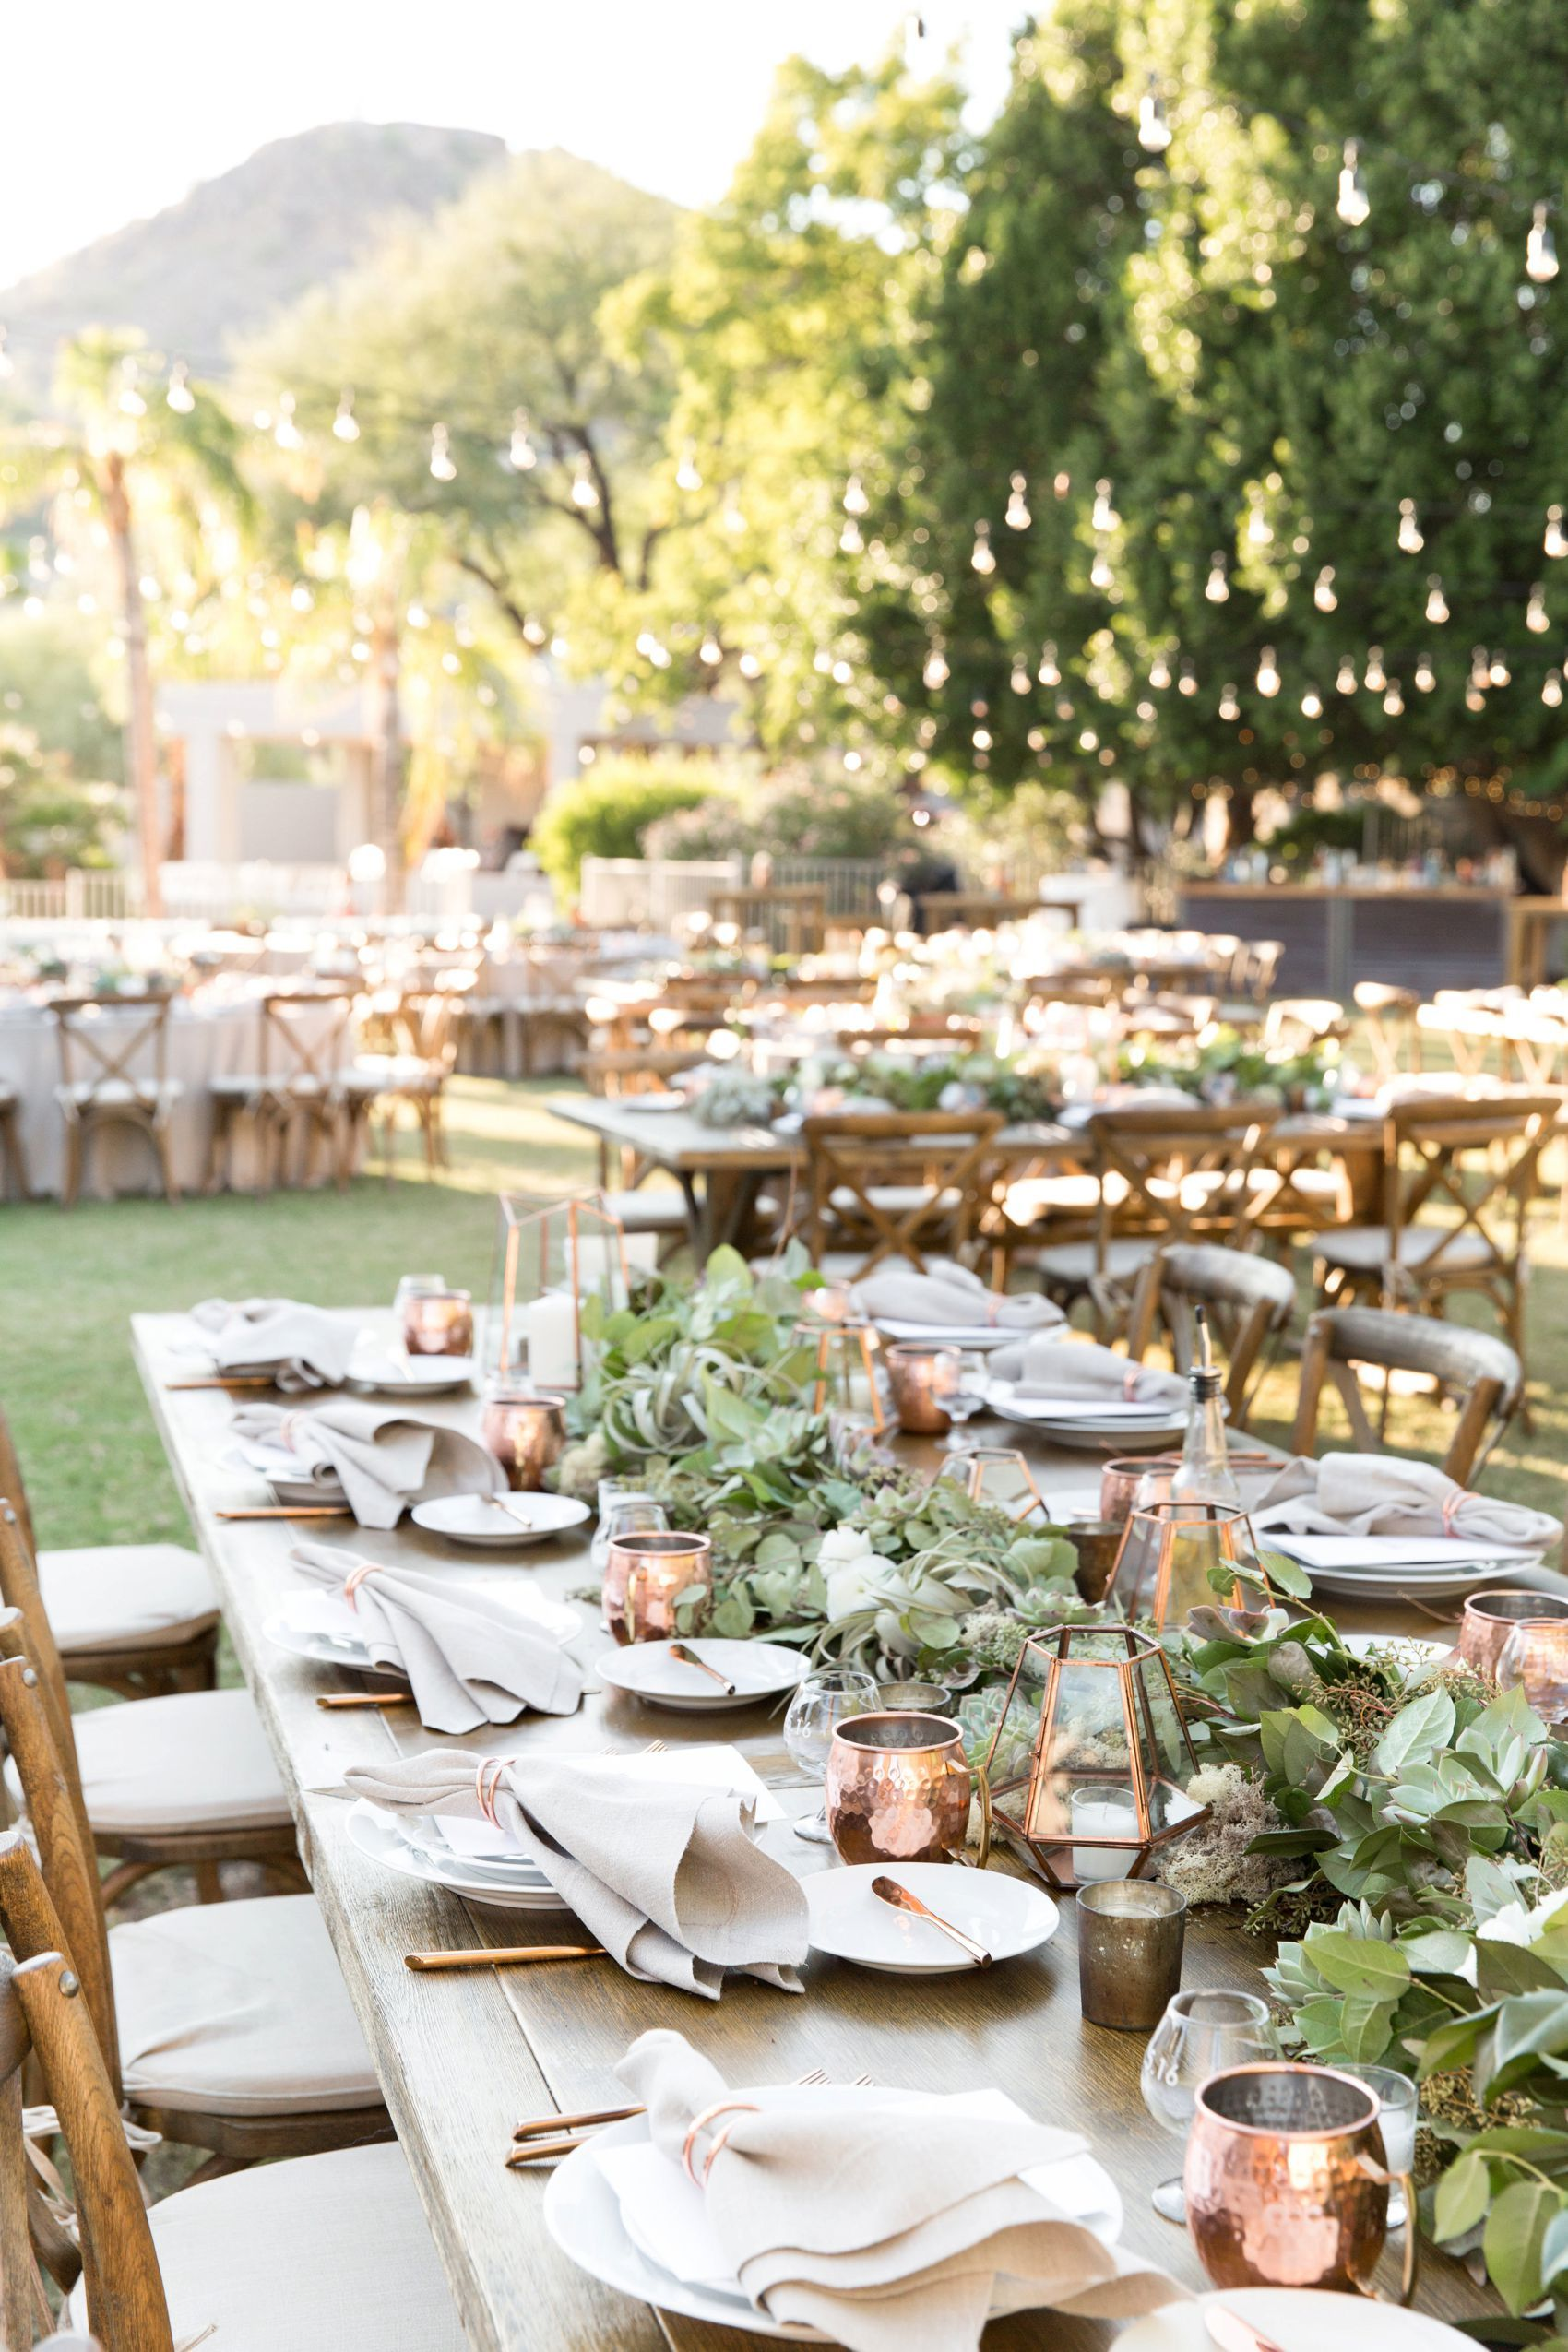 37 Table Decoration Ideas For A Summer Garden Party ... on Backyard Table Decor id=82765